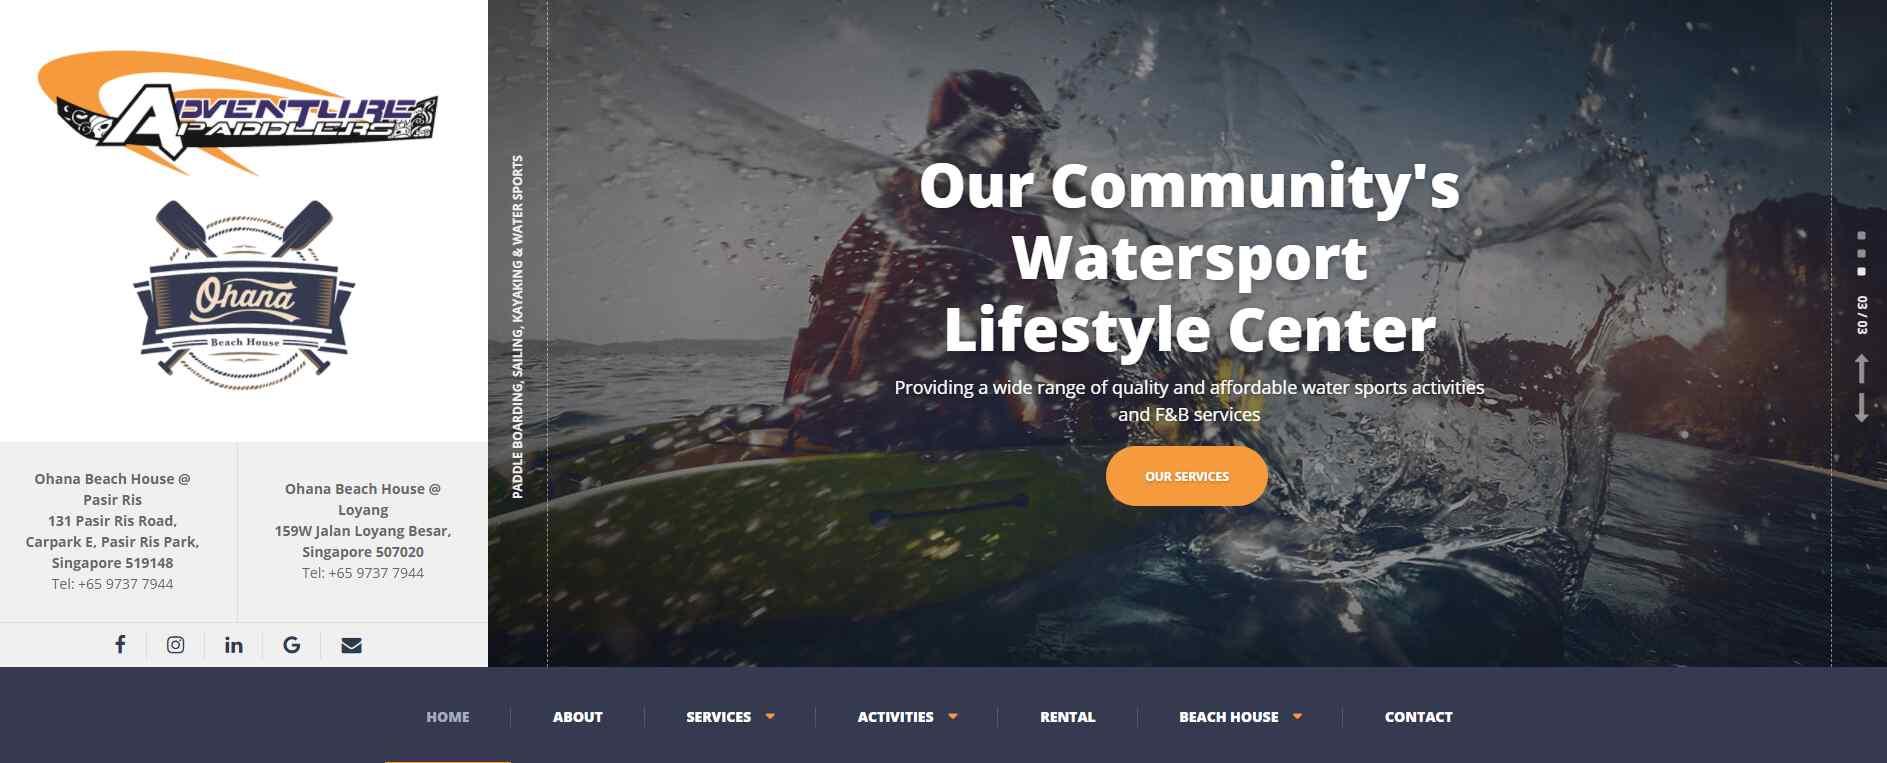 adventure paddlers Top Kayaking Activities in Singapore